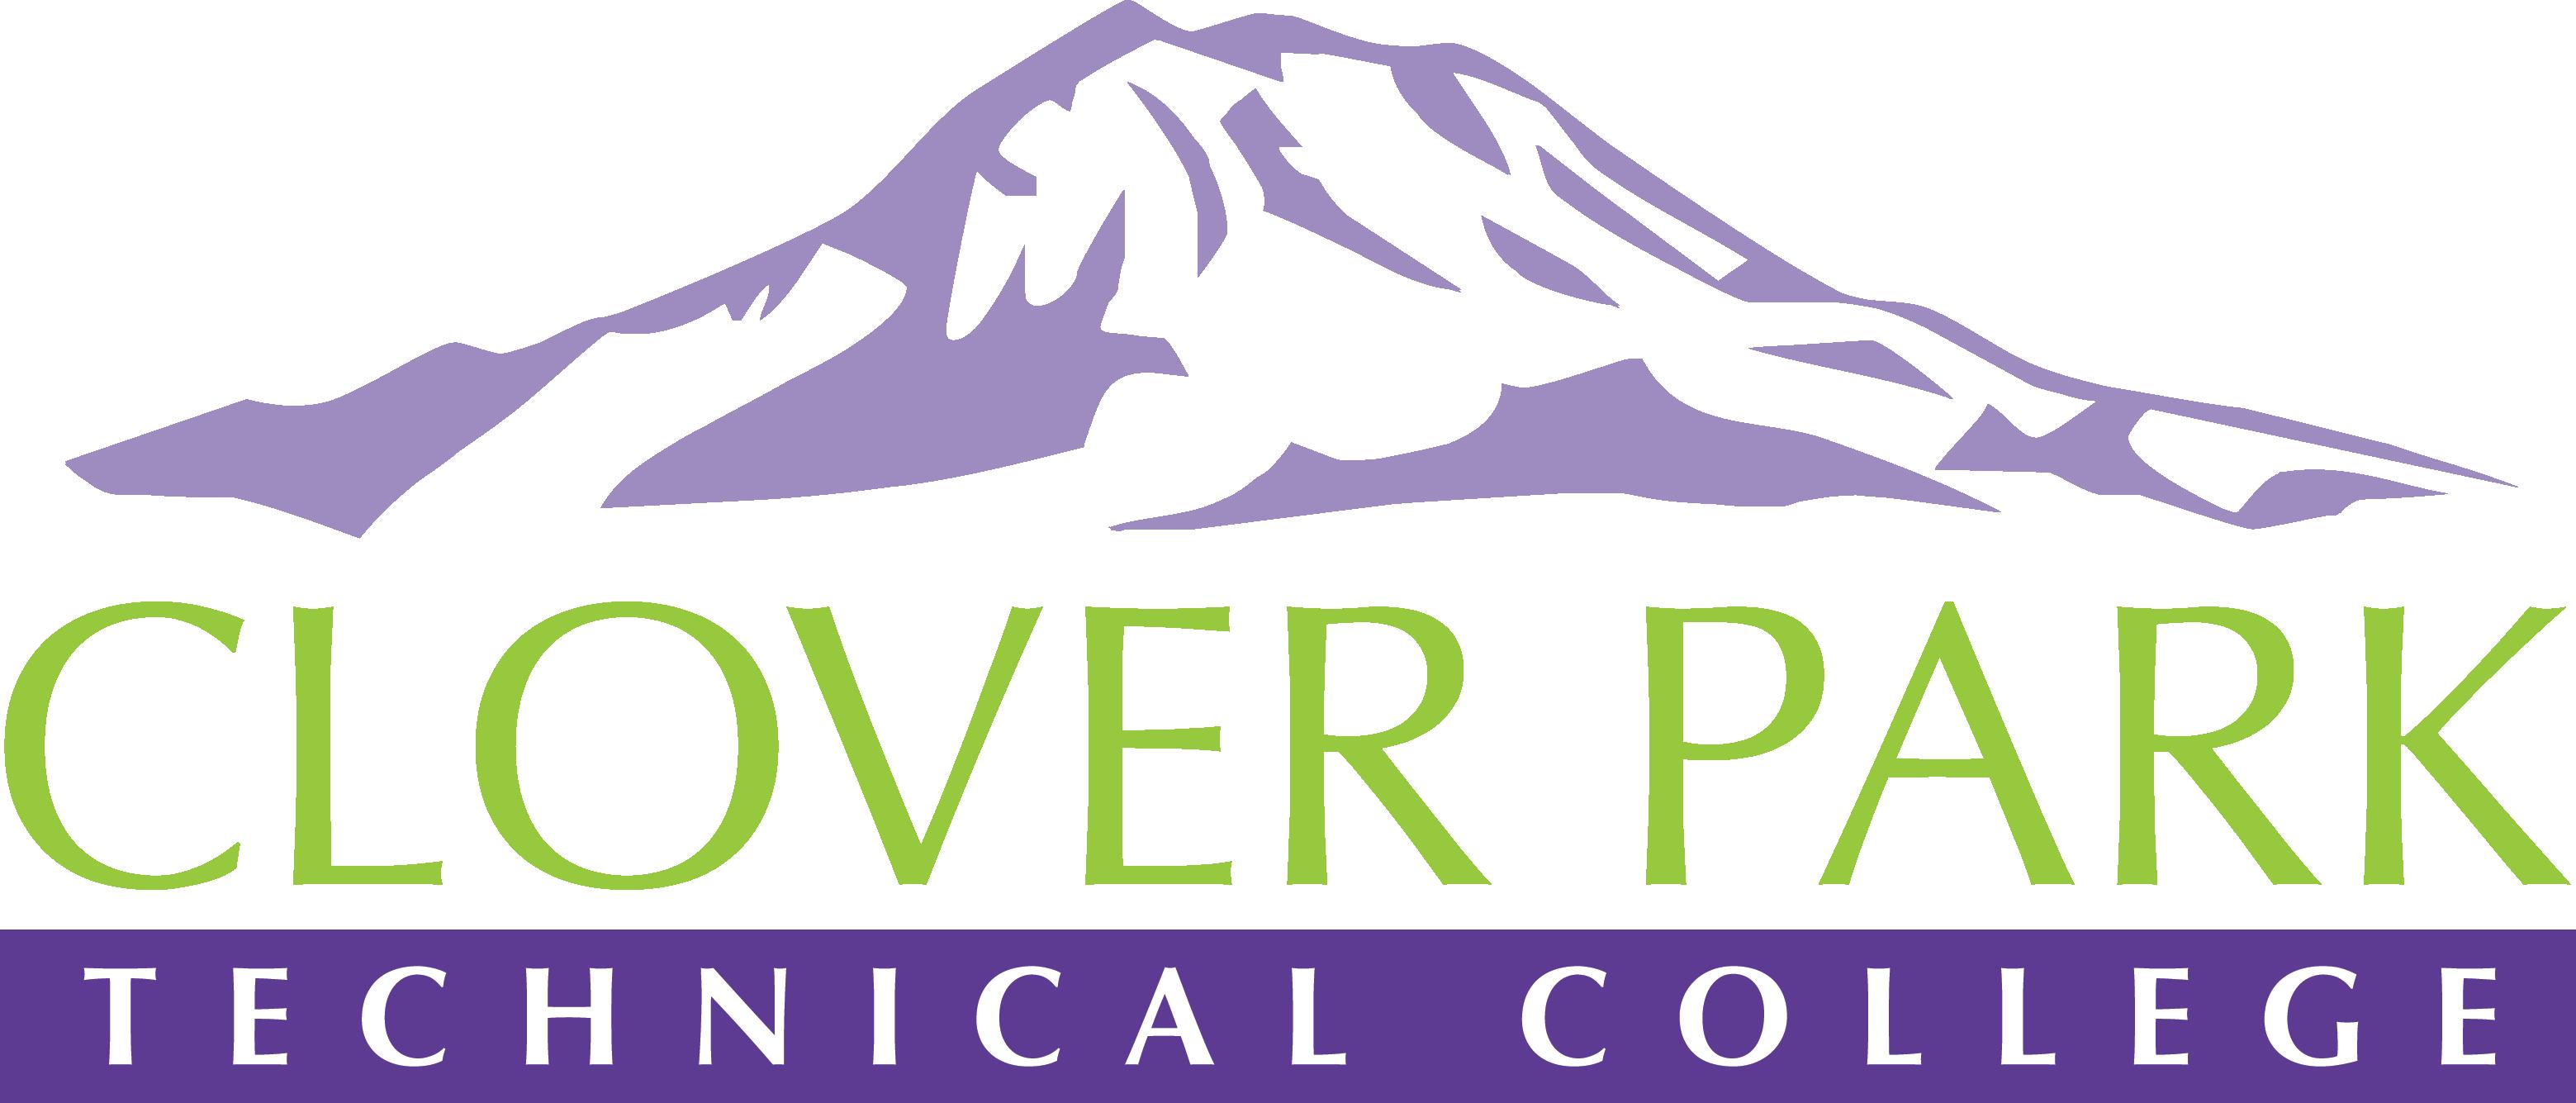 Clover Park Technical College